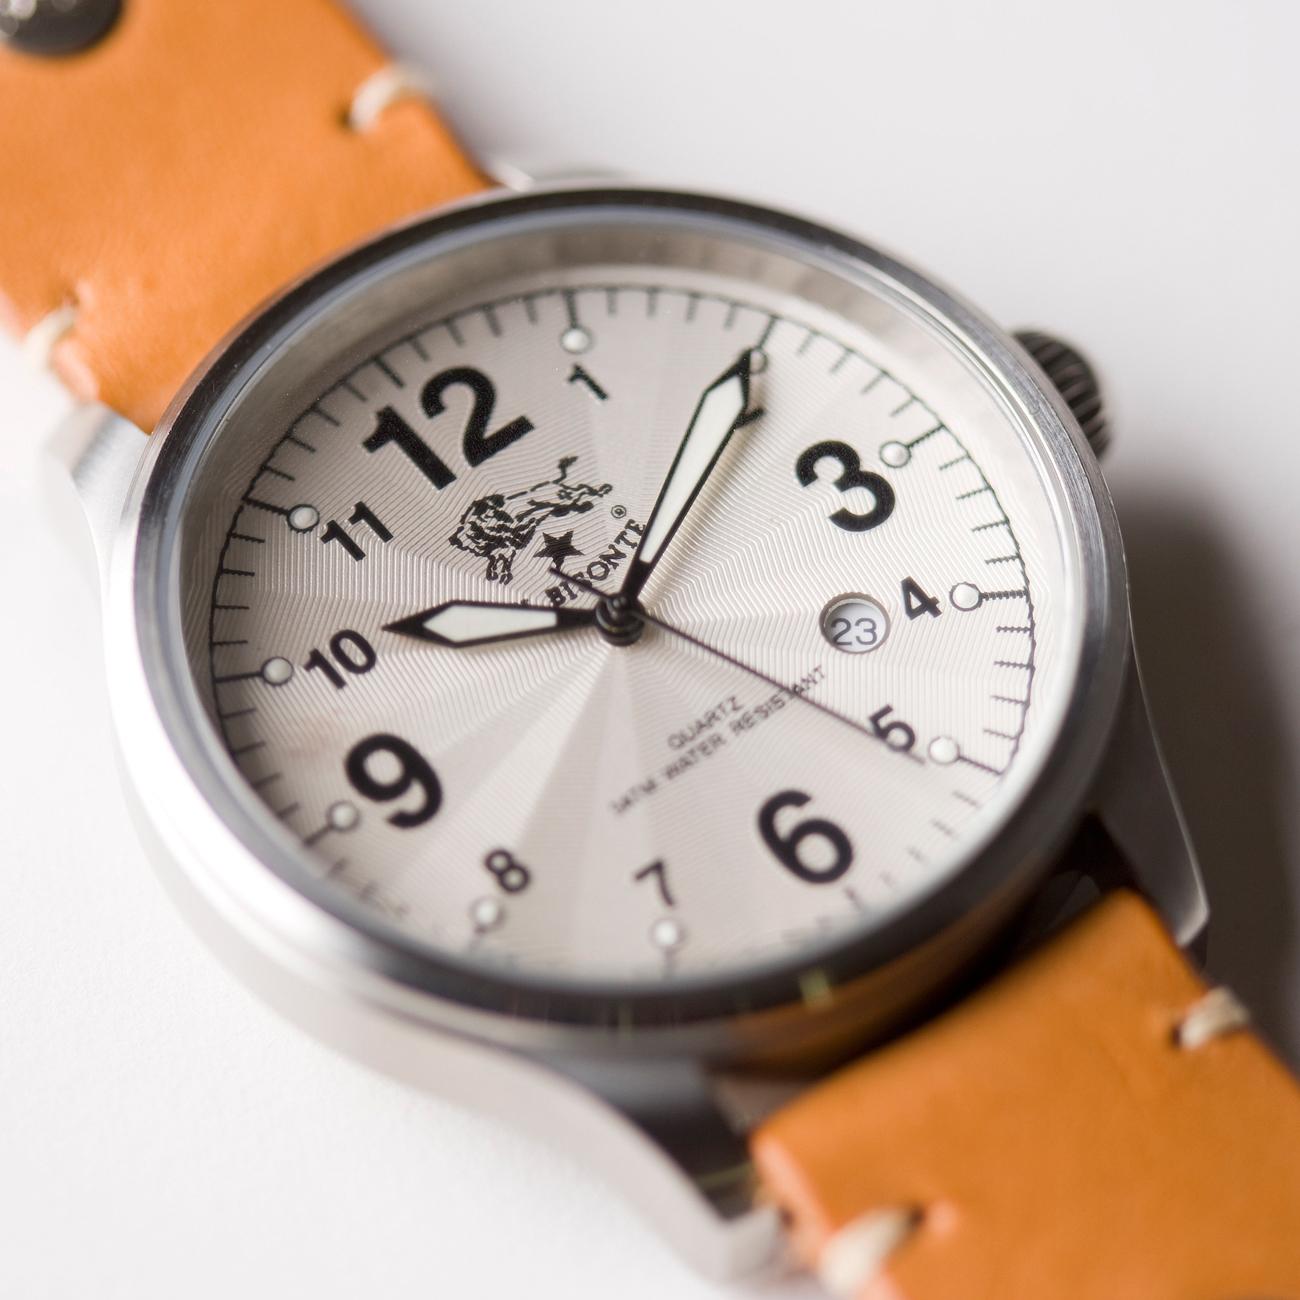 IL BISONTE (イル ビゾンテ) 日本公式オンラインストア 腕時計(フェイス) 5422310397